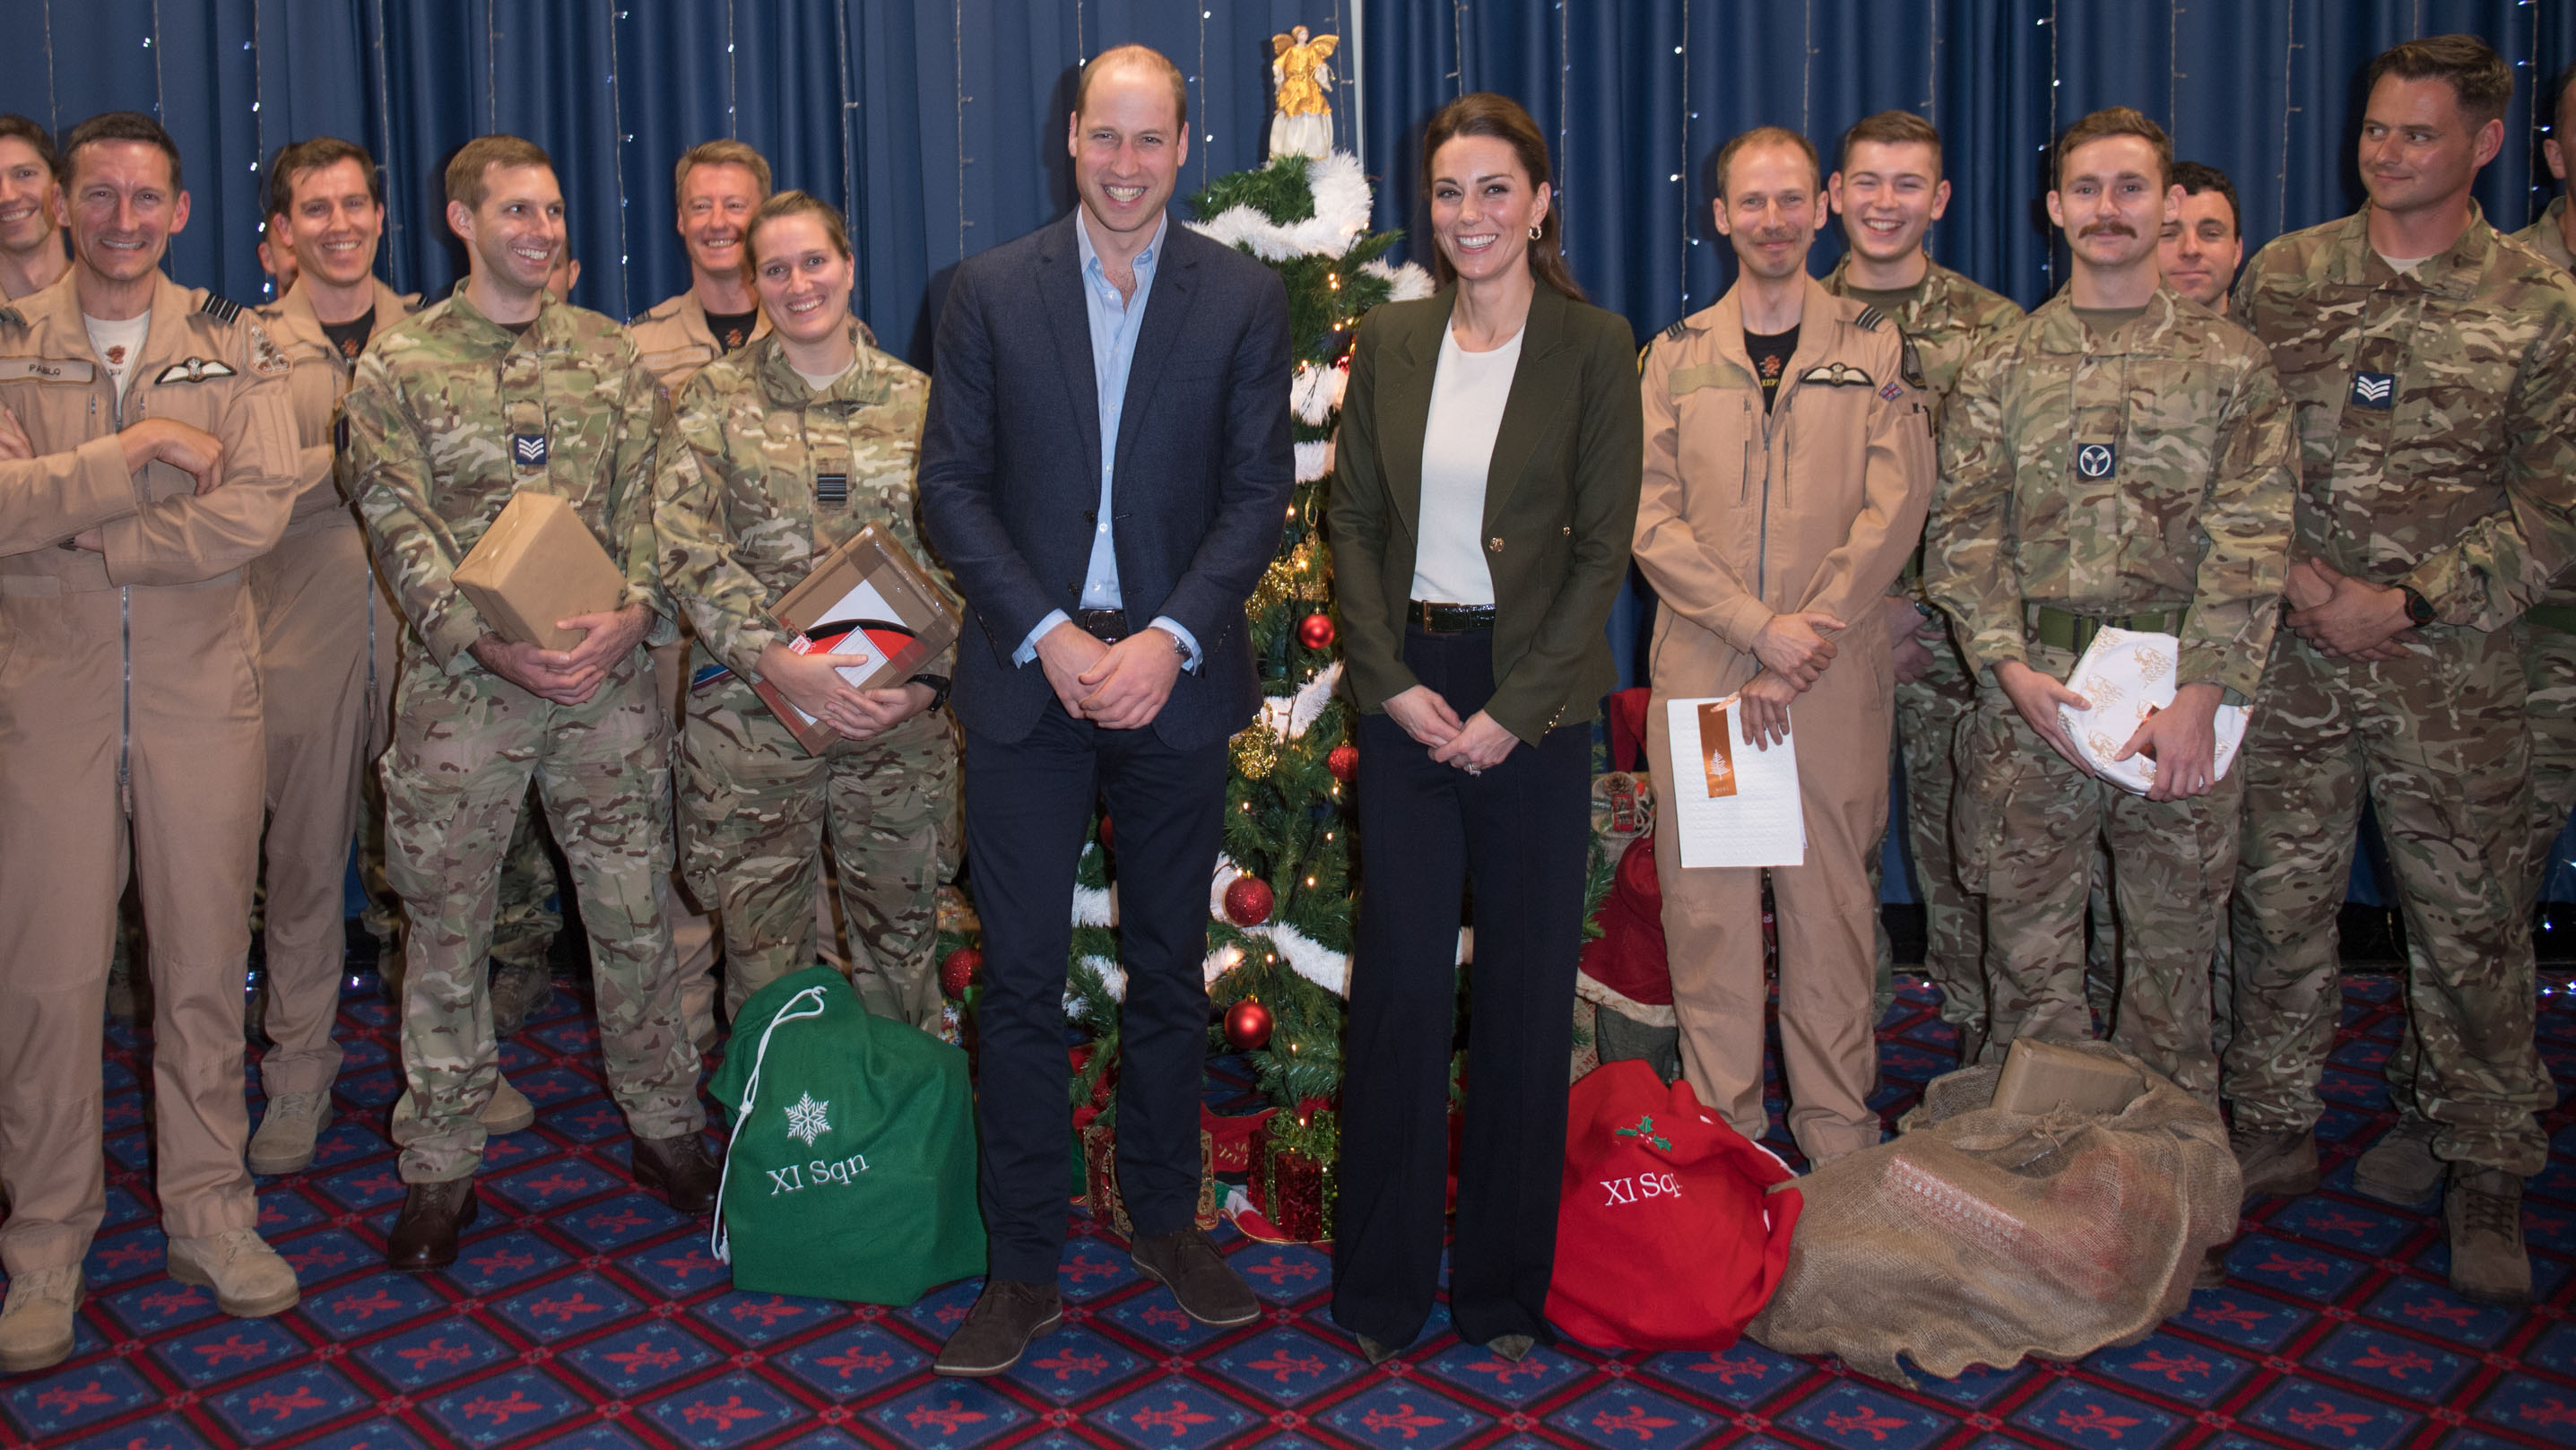 Prince William says Kate Middleton looks like a Christmas tree